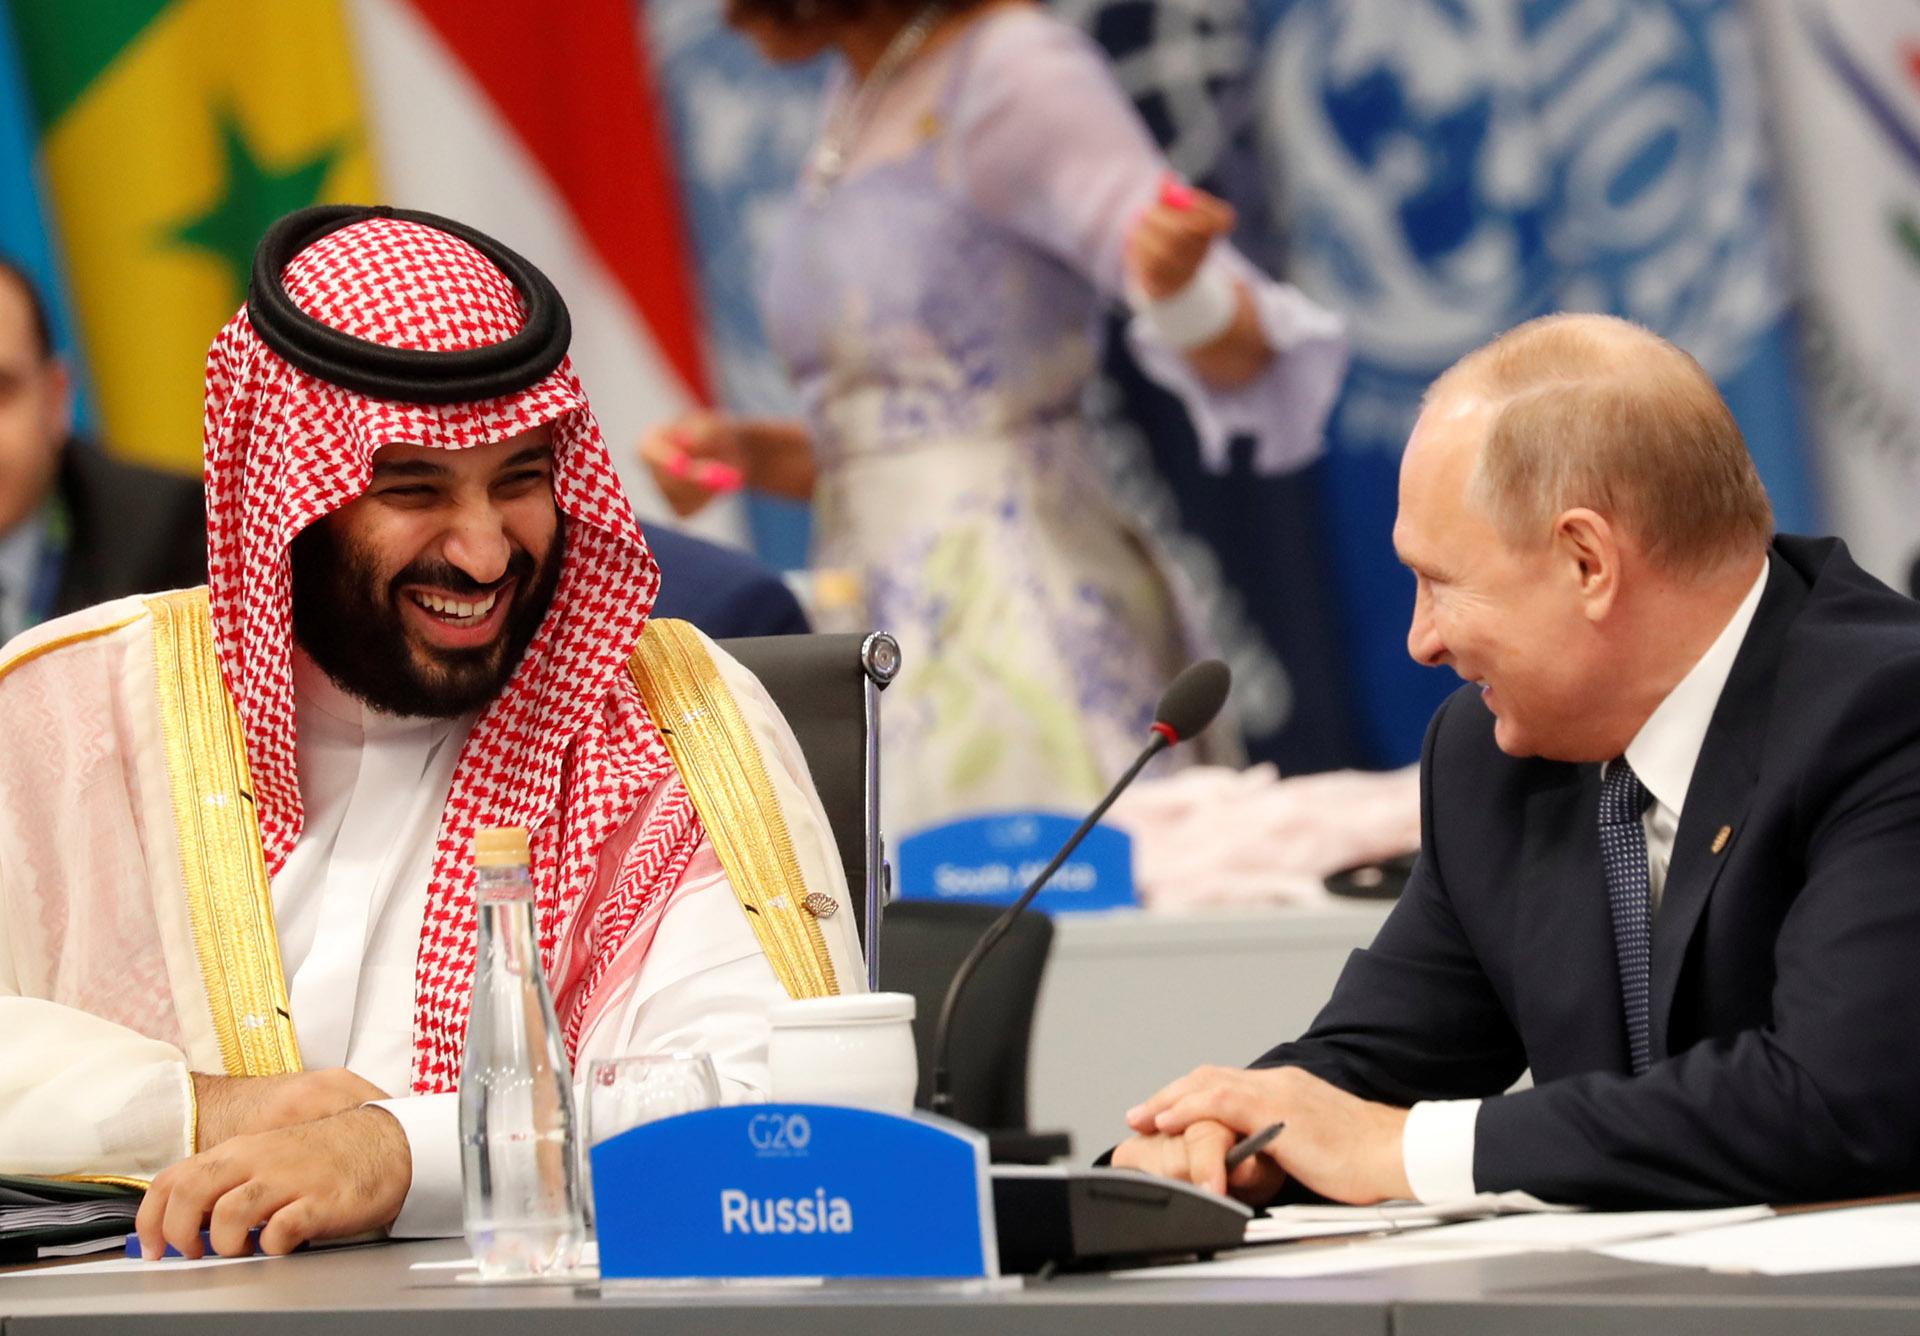 Bin Salman y Putin comperten risas